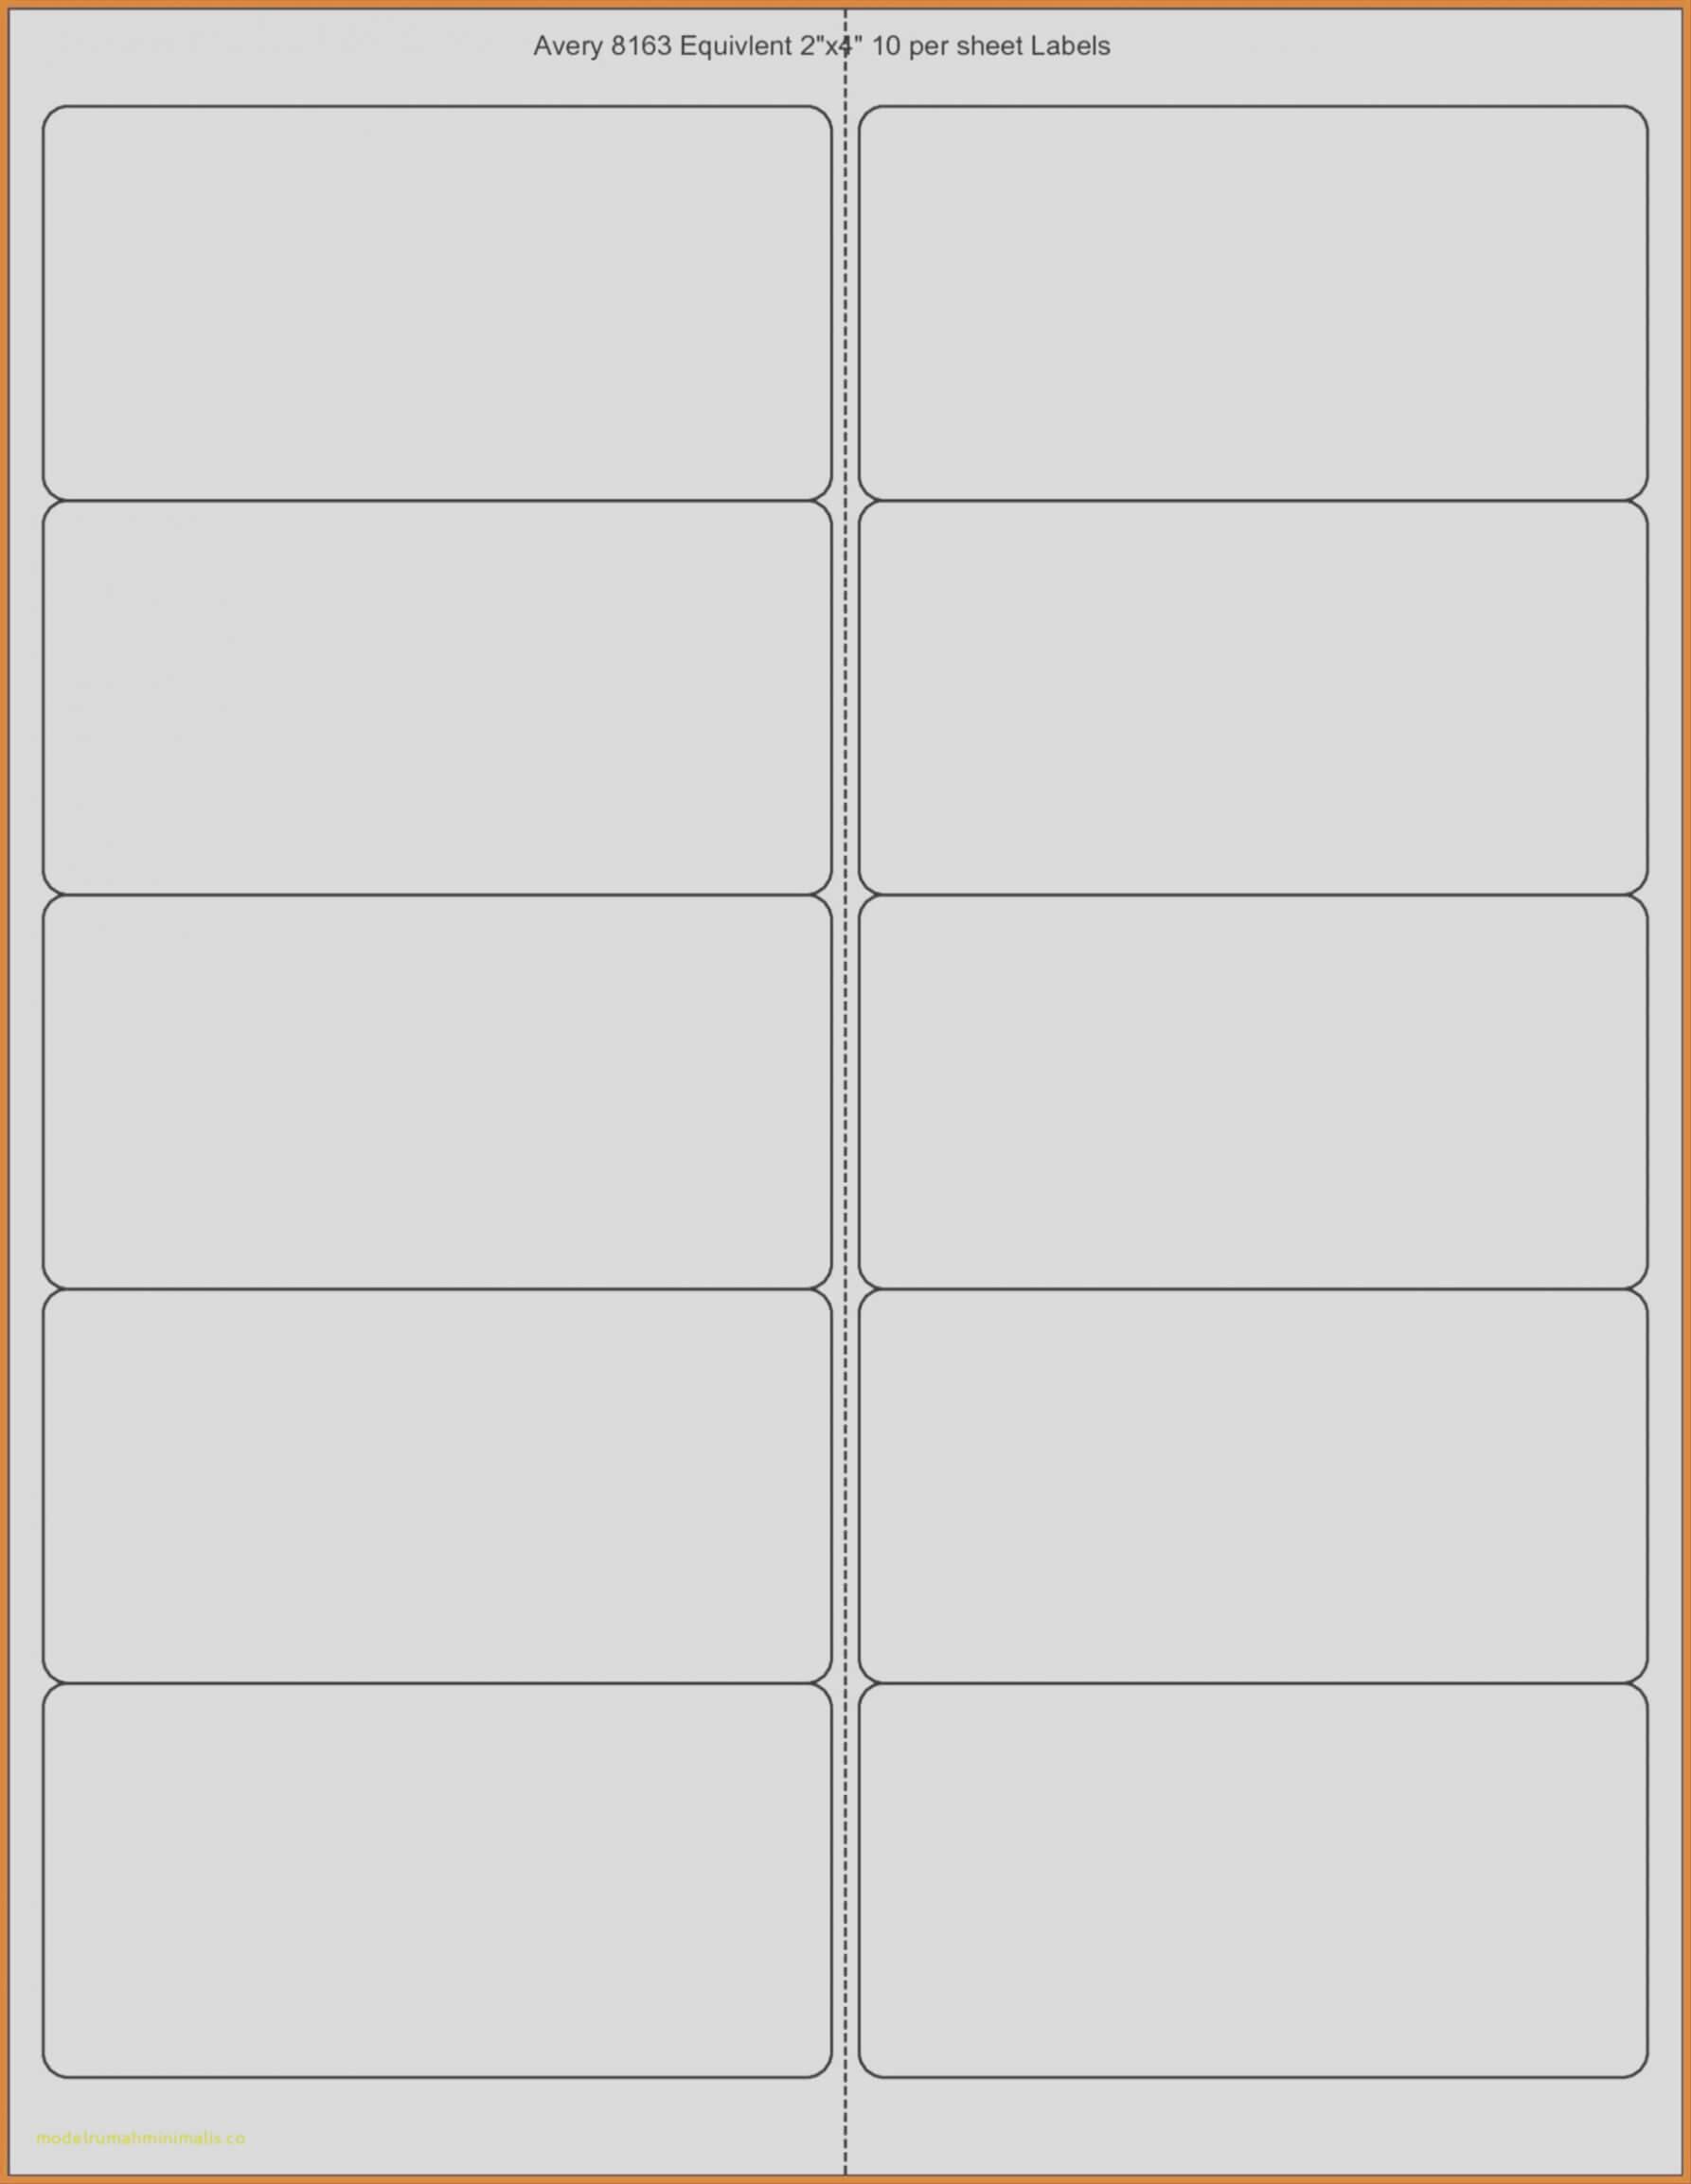 Word Label Template 11 Per Sheet A11 311 Unique Graph Avery For Word Label Template 12 Per Sheet